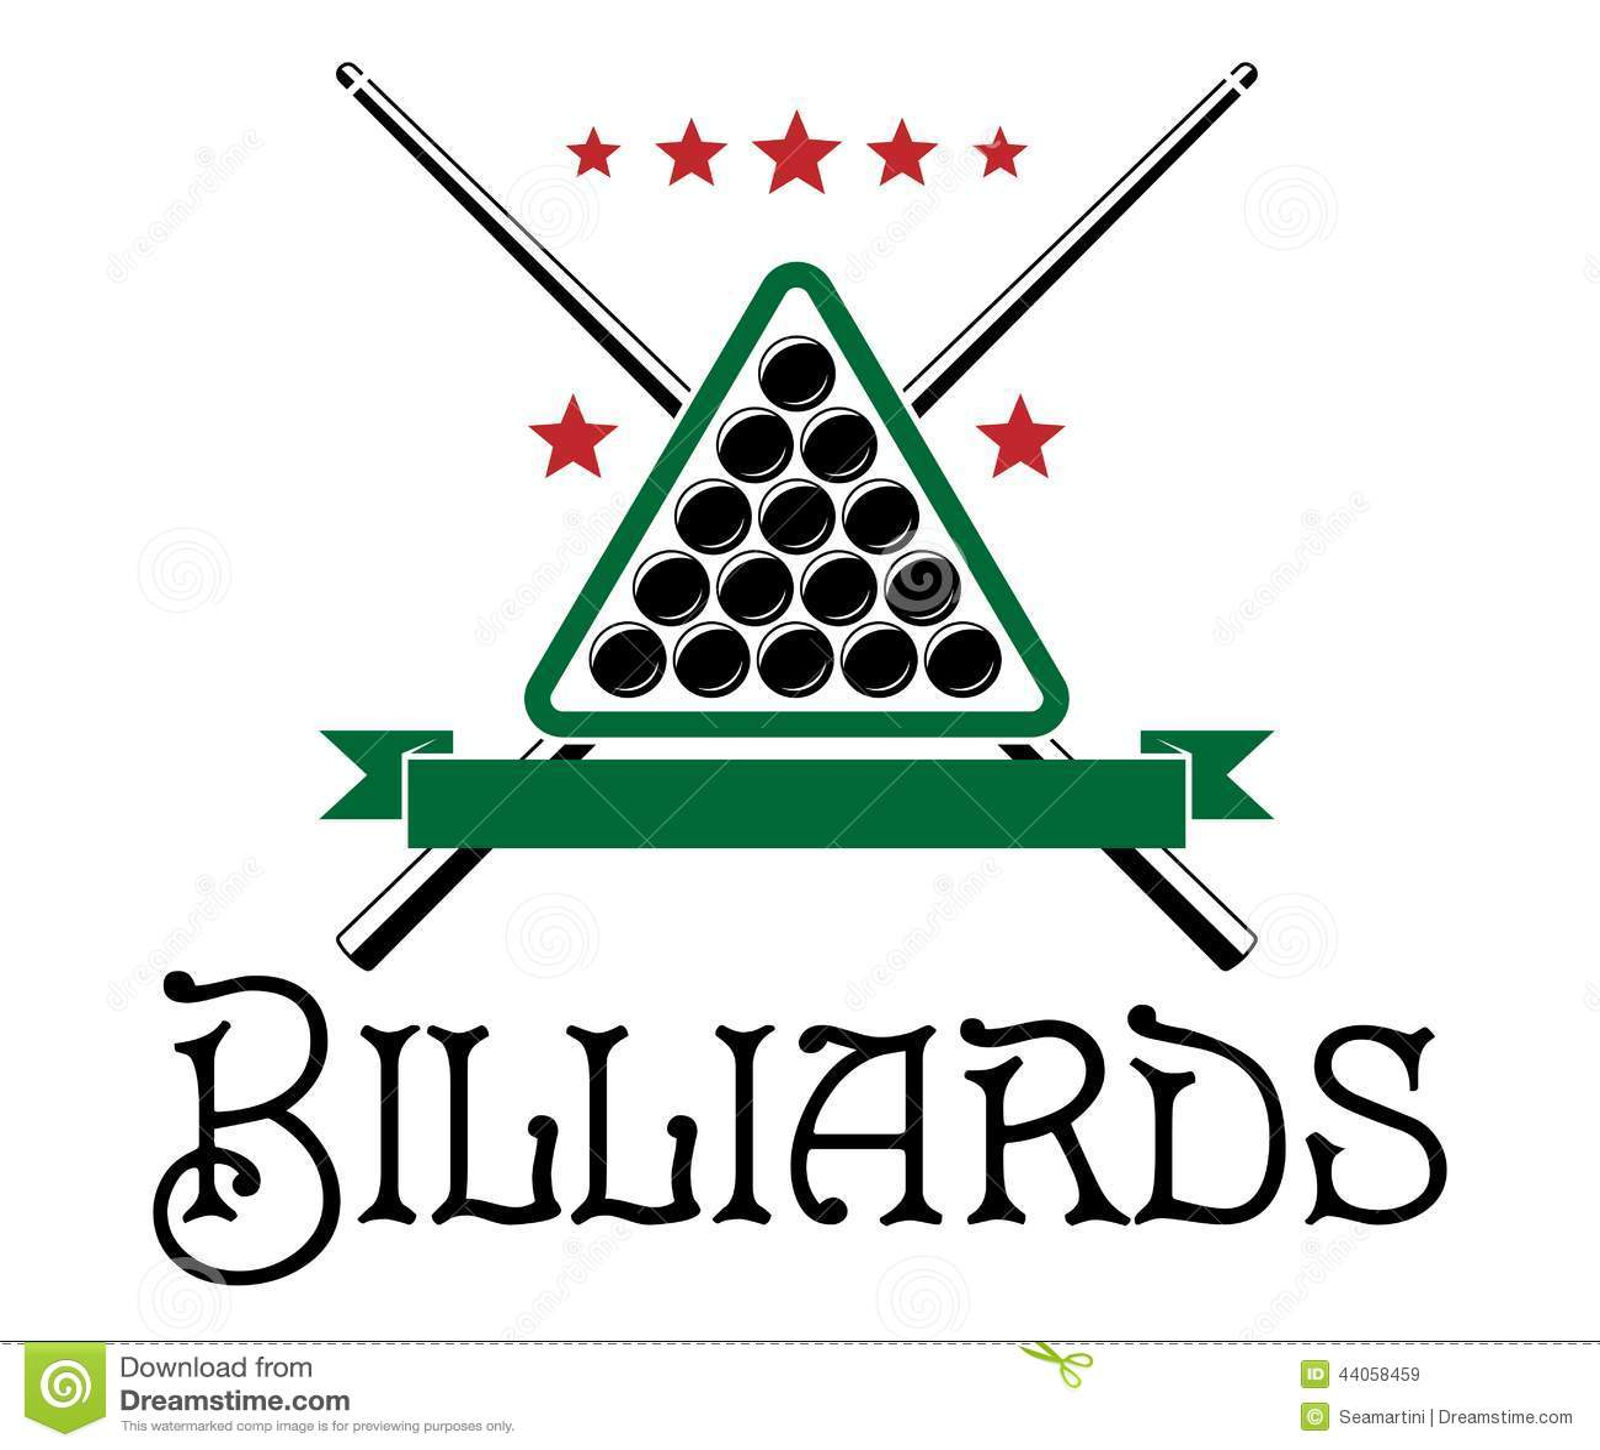 Billiard business plan